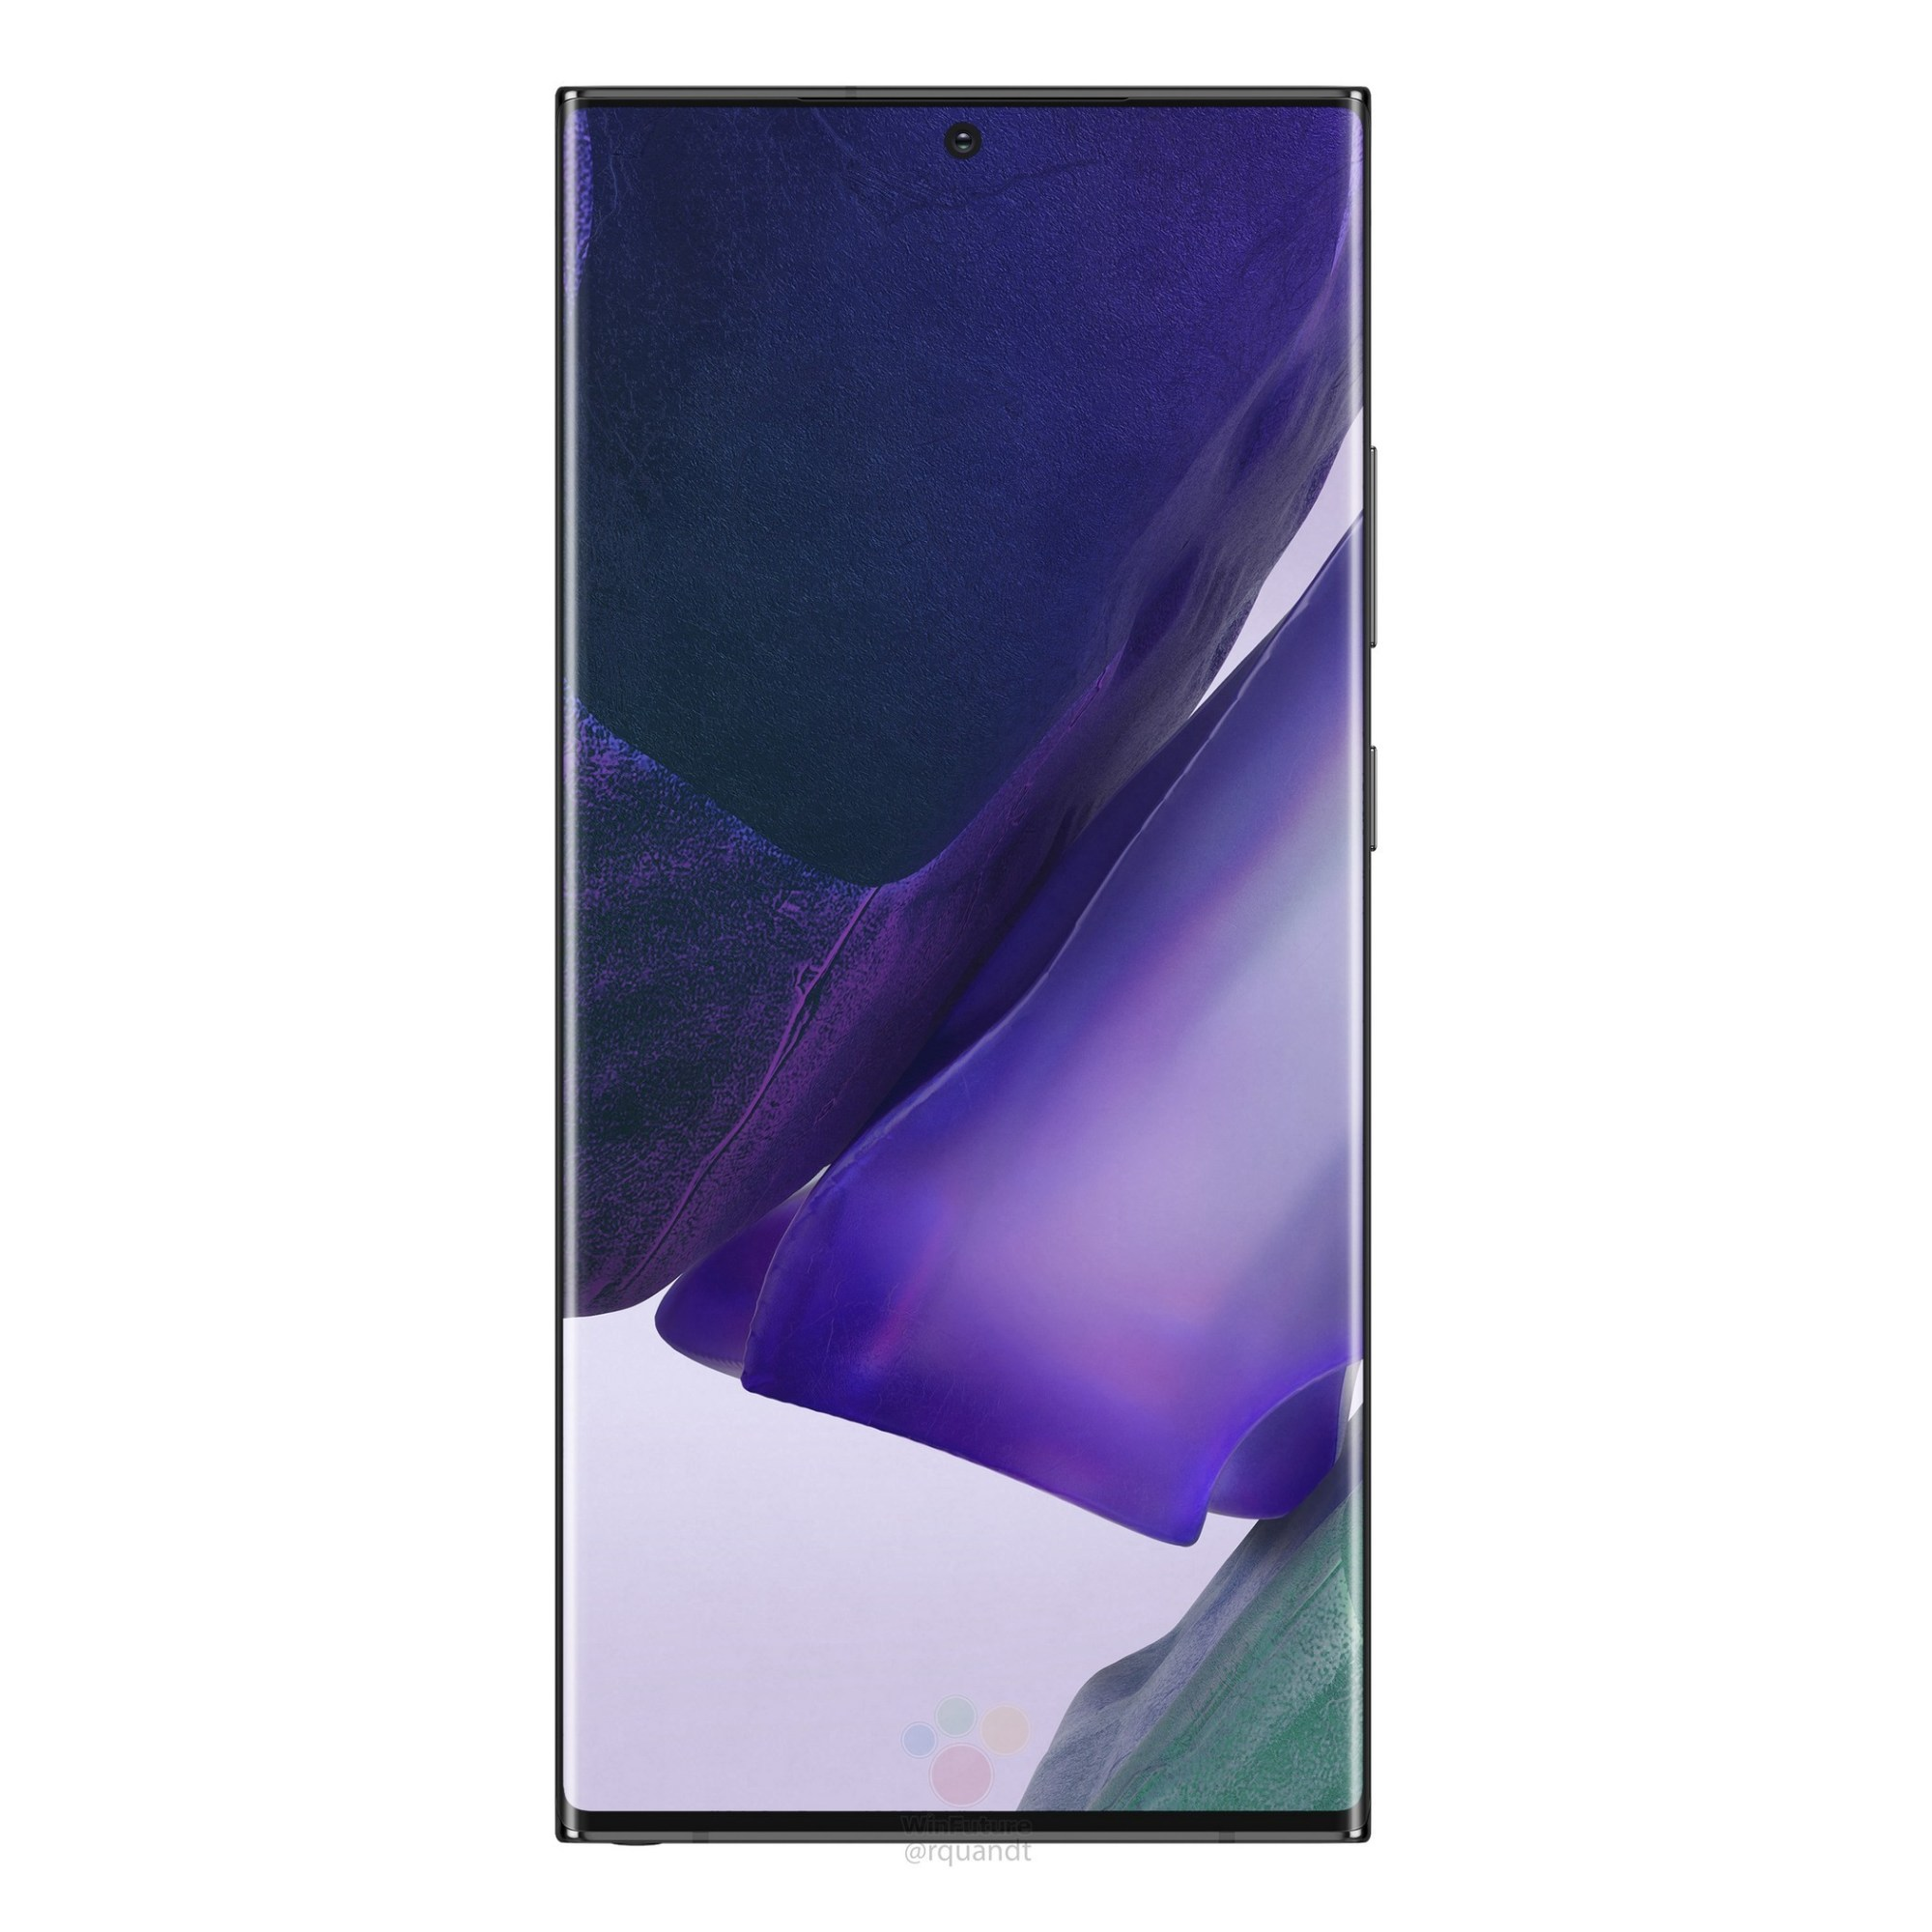 Samsung Galaxy Note 20 Ultra in Mystic Black